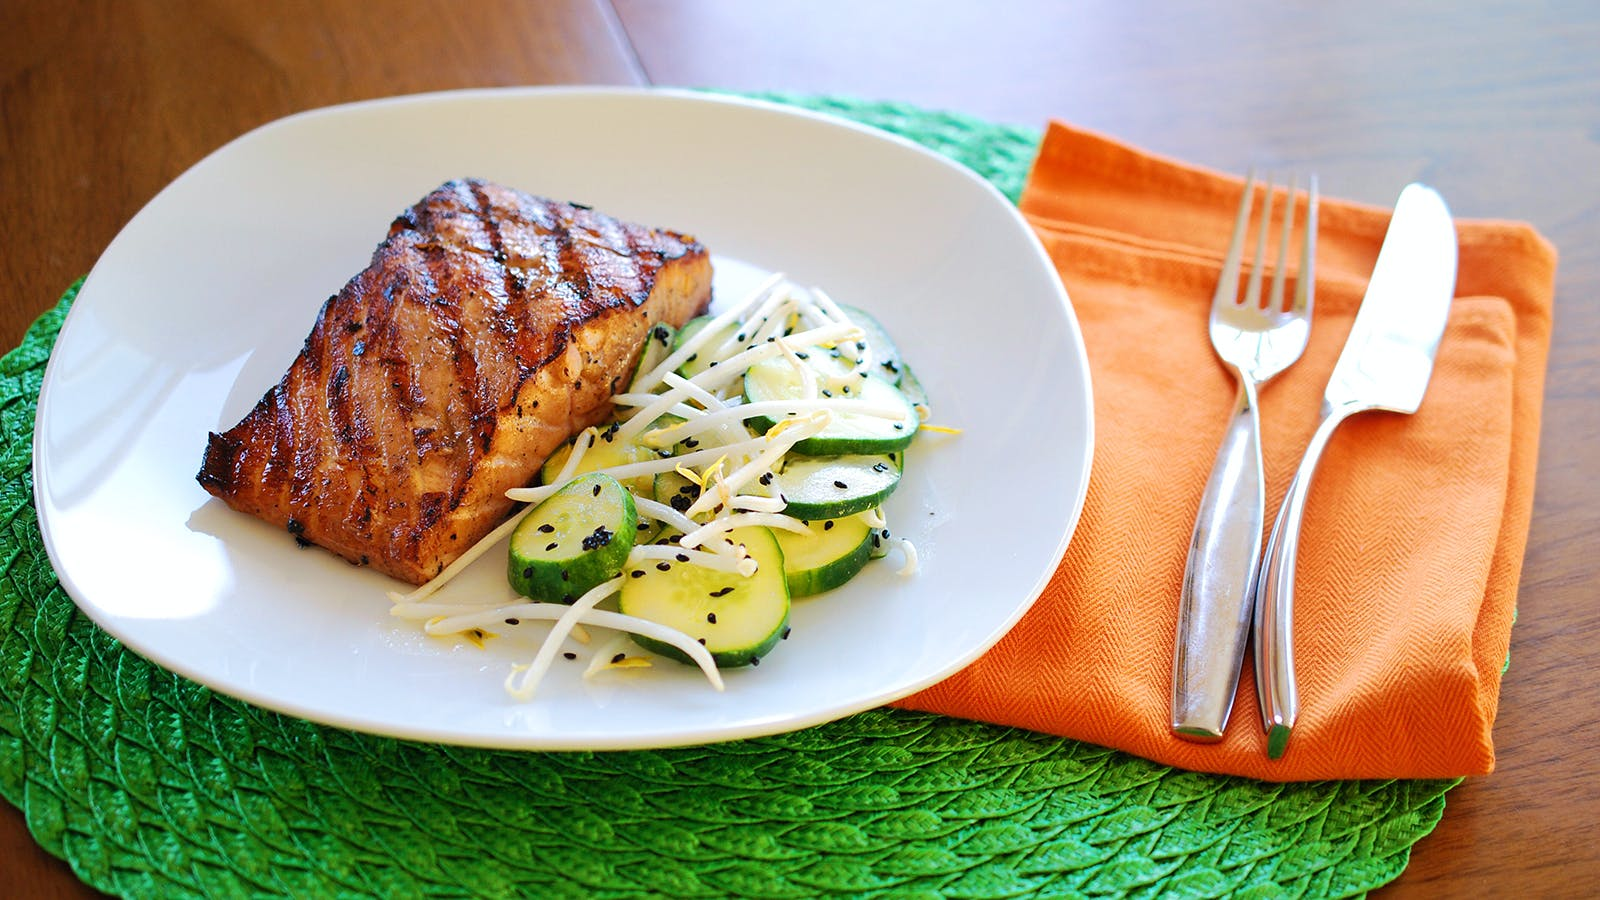 8 & $20: Miso-Sesame Salmon with Cucumber Salad